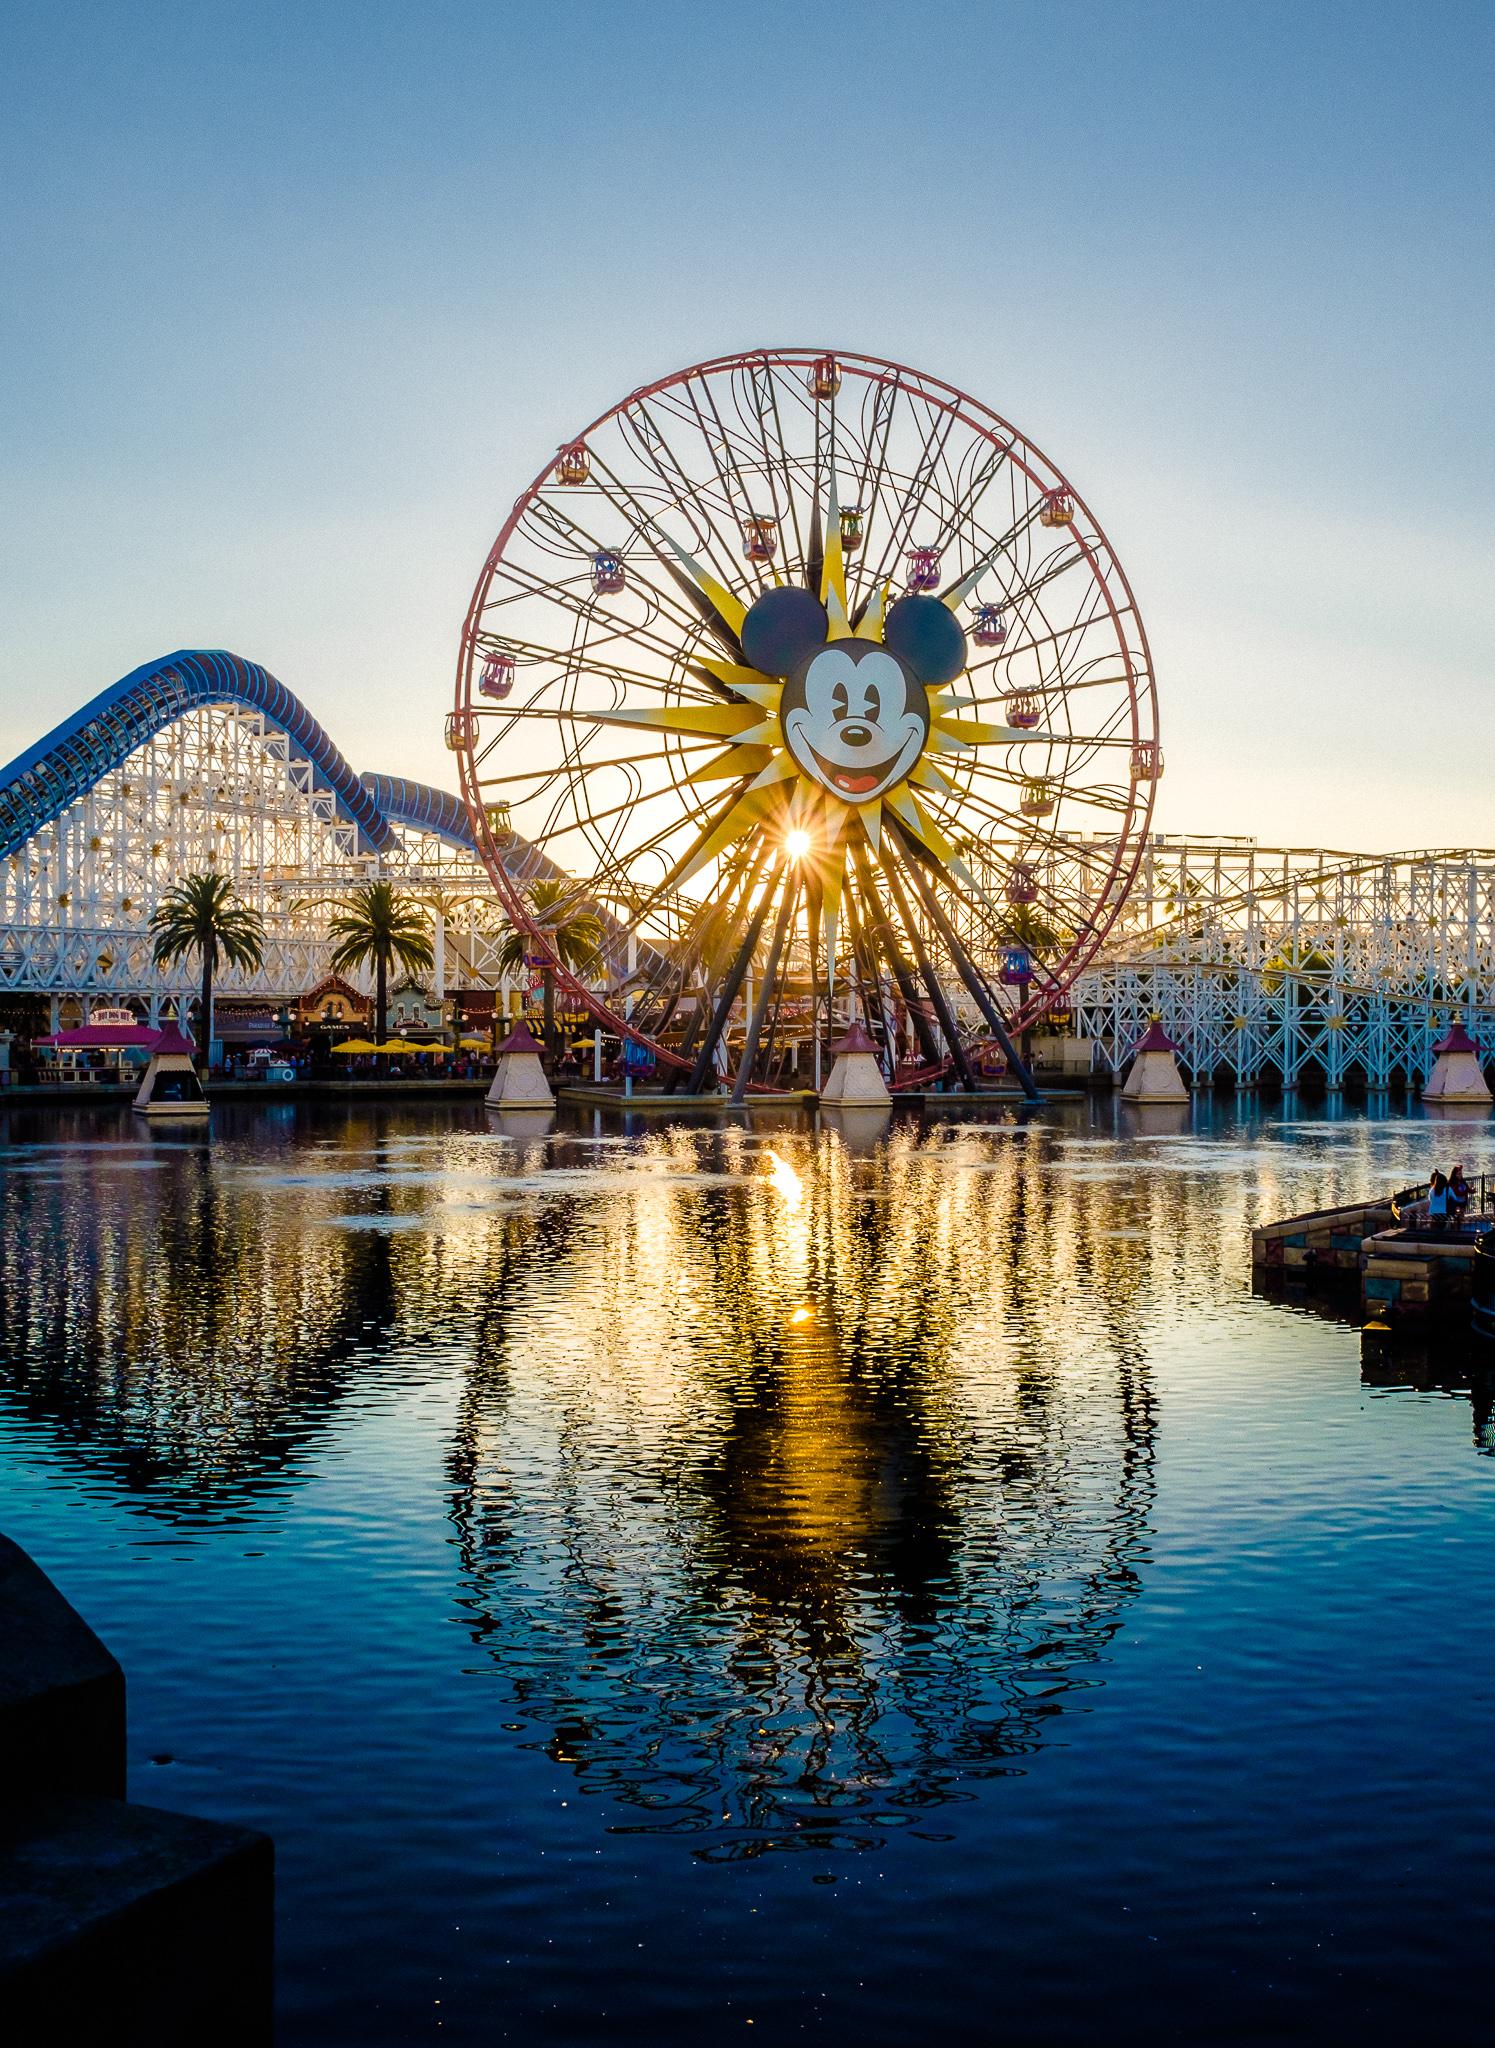 The sun dips below Mickey's Fun Wheel at Disney's California Adventure. [ Fujifilm X100t, f/11, 1/170s, ISO 200 ]